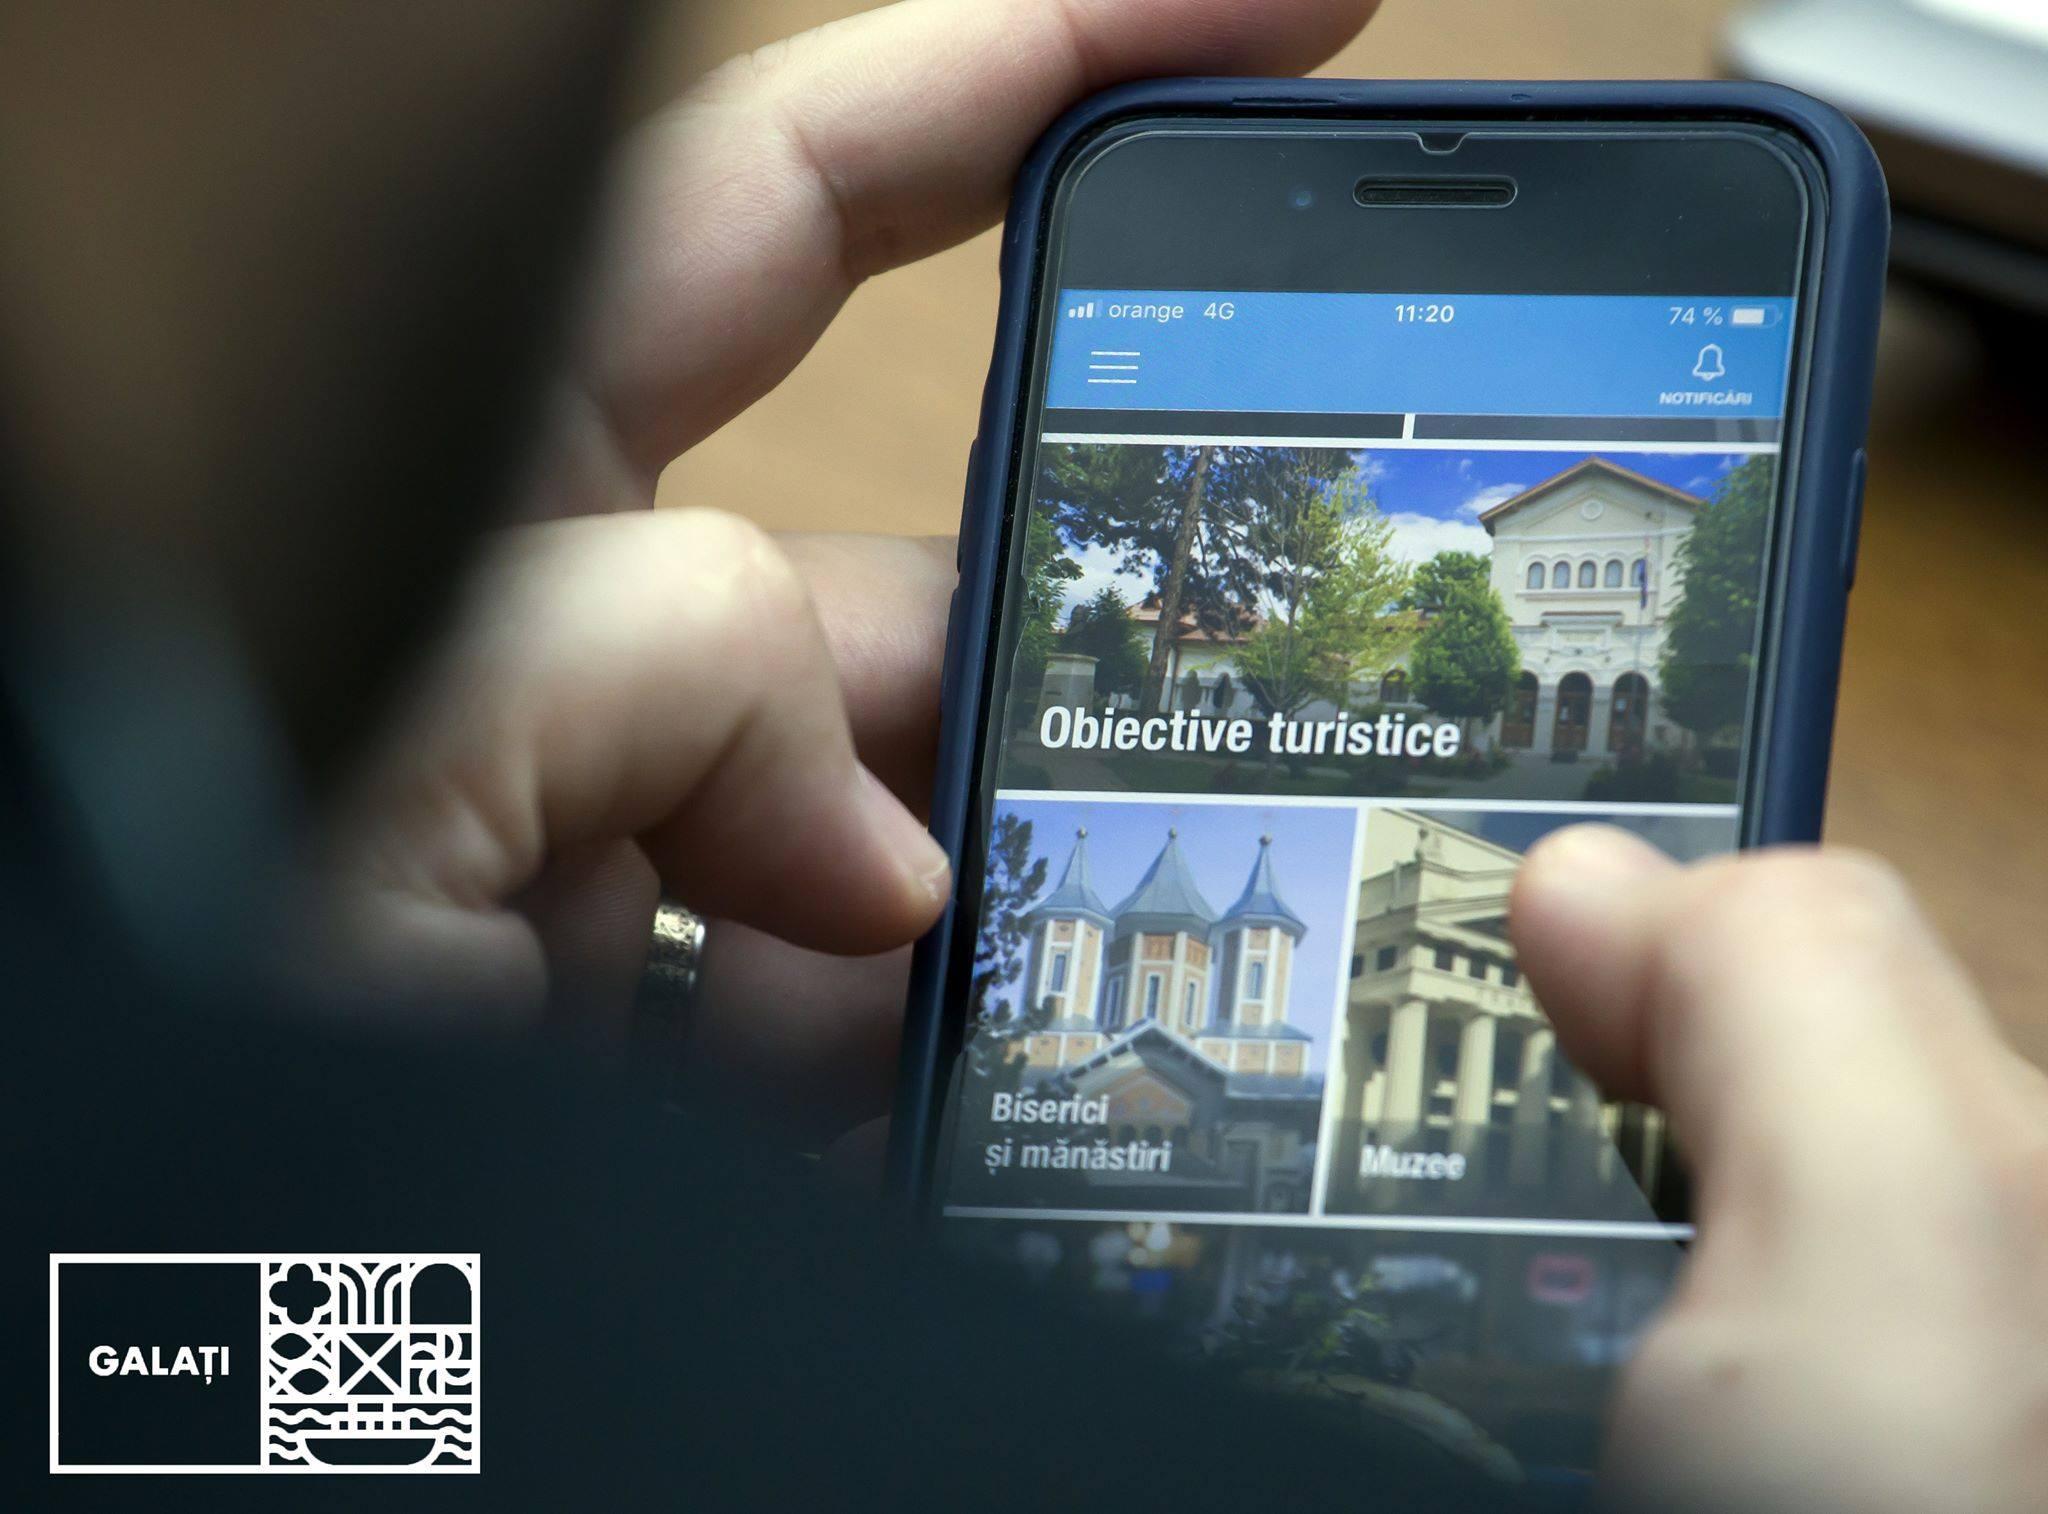 Galati City App